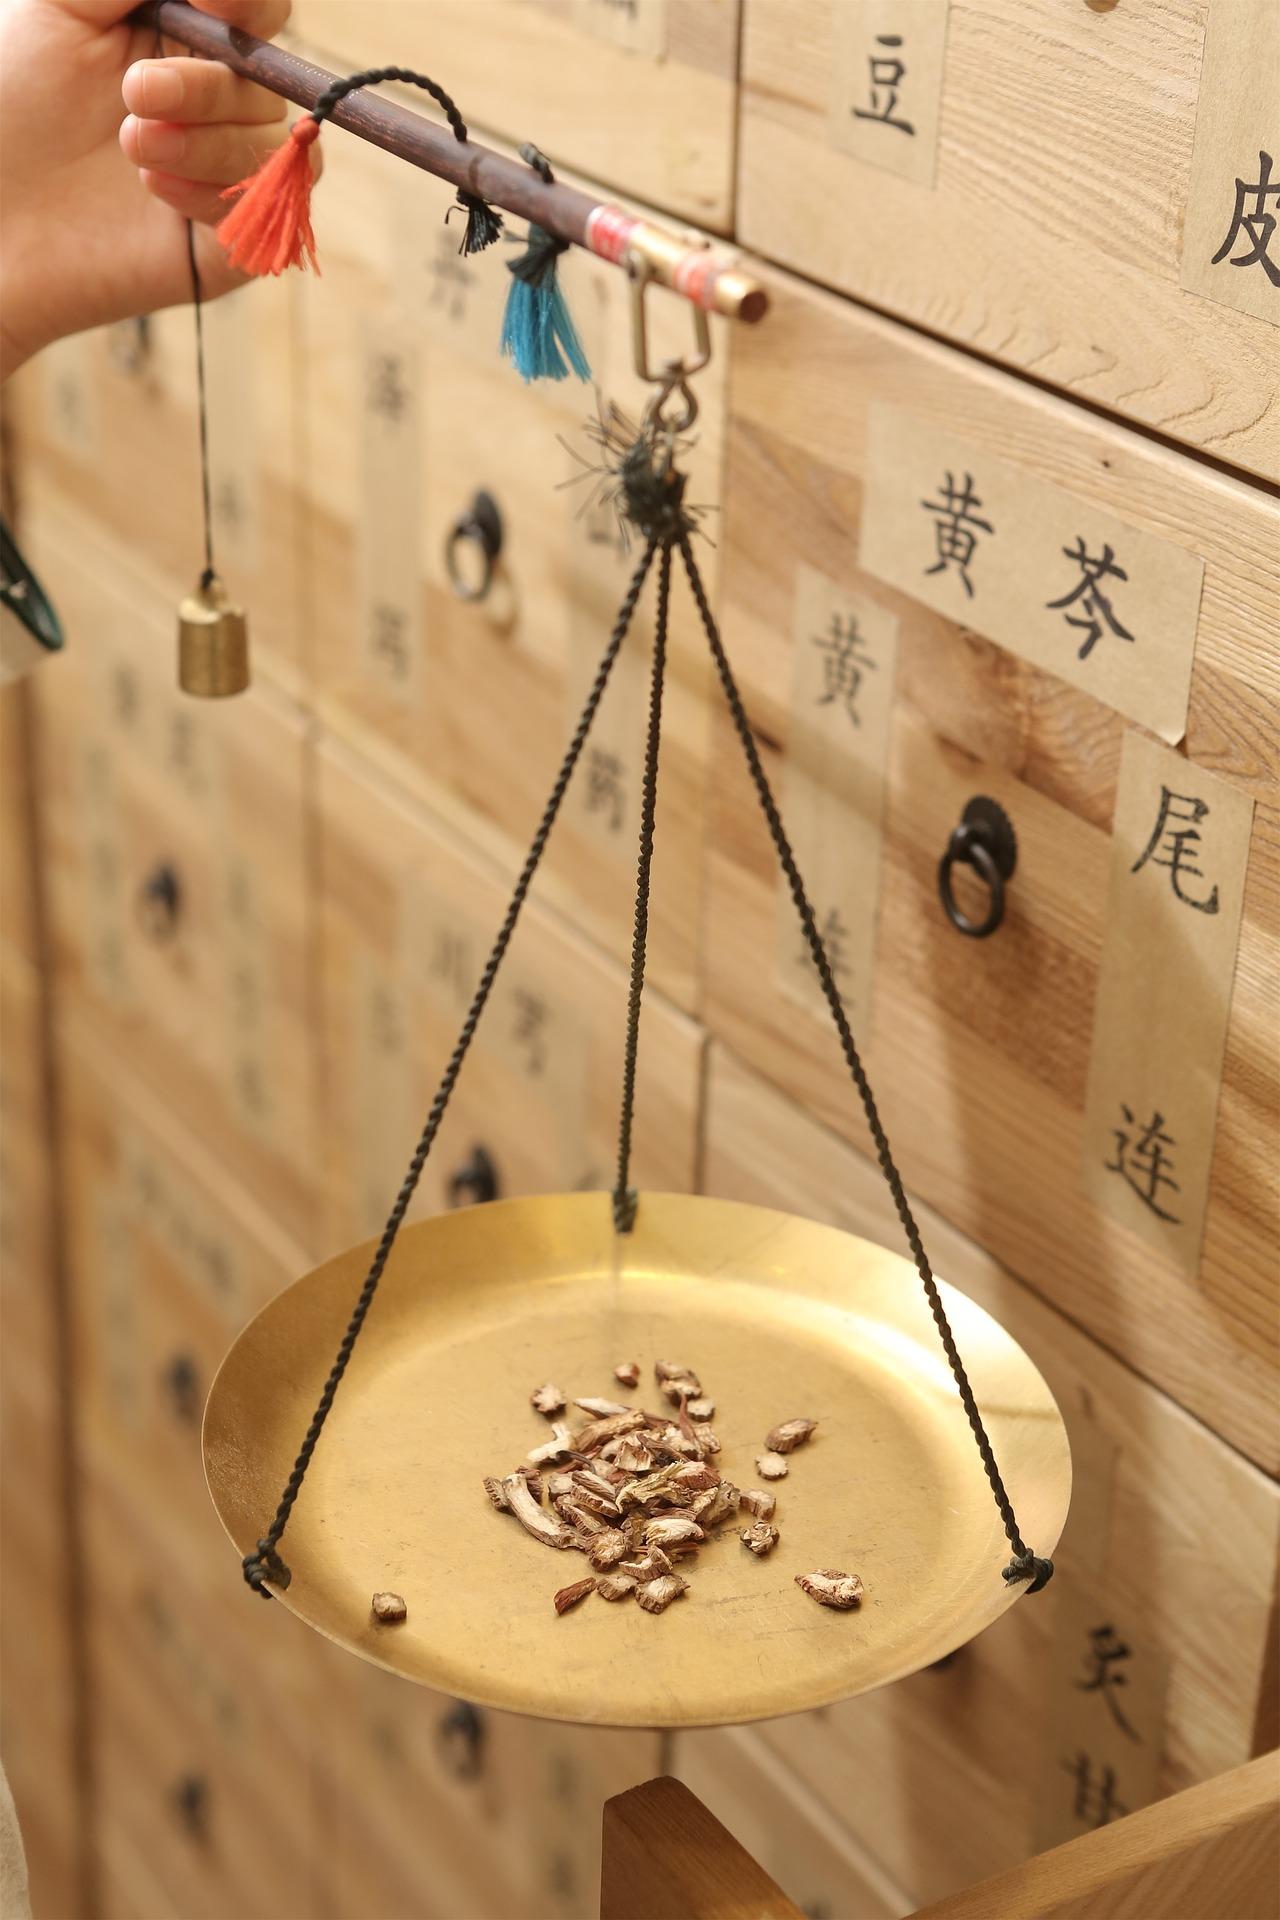 chinese-medicine-3666174_1920.jpg